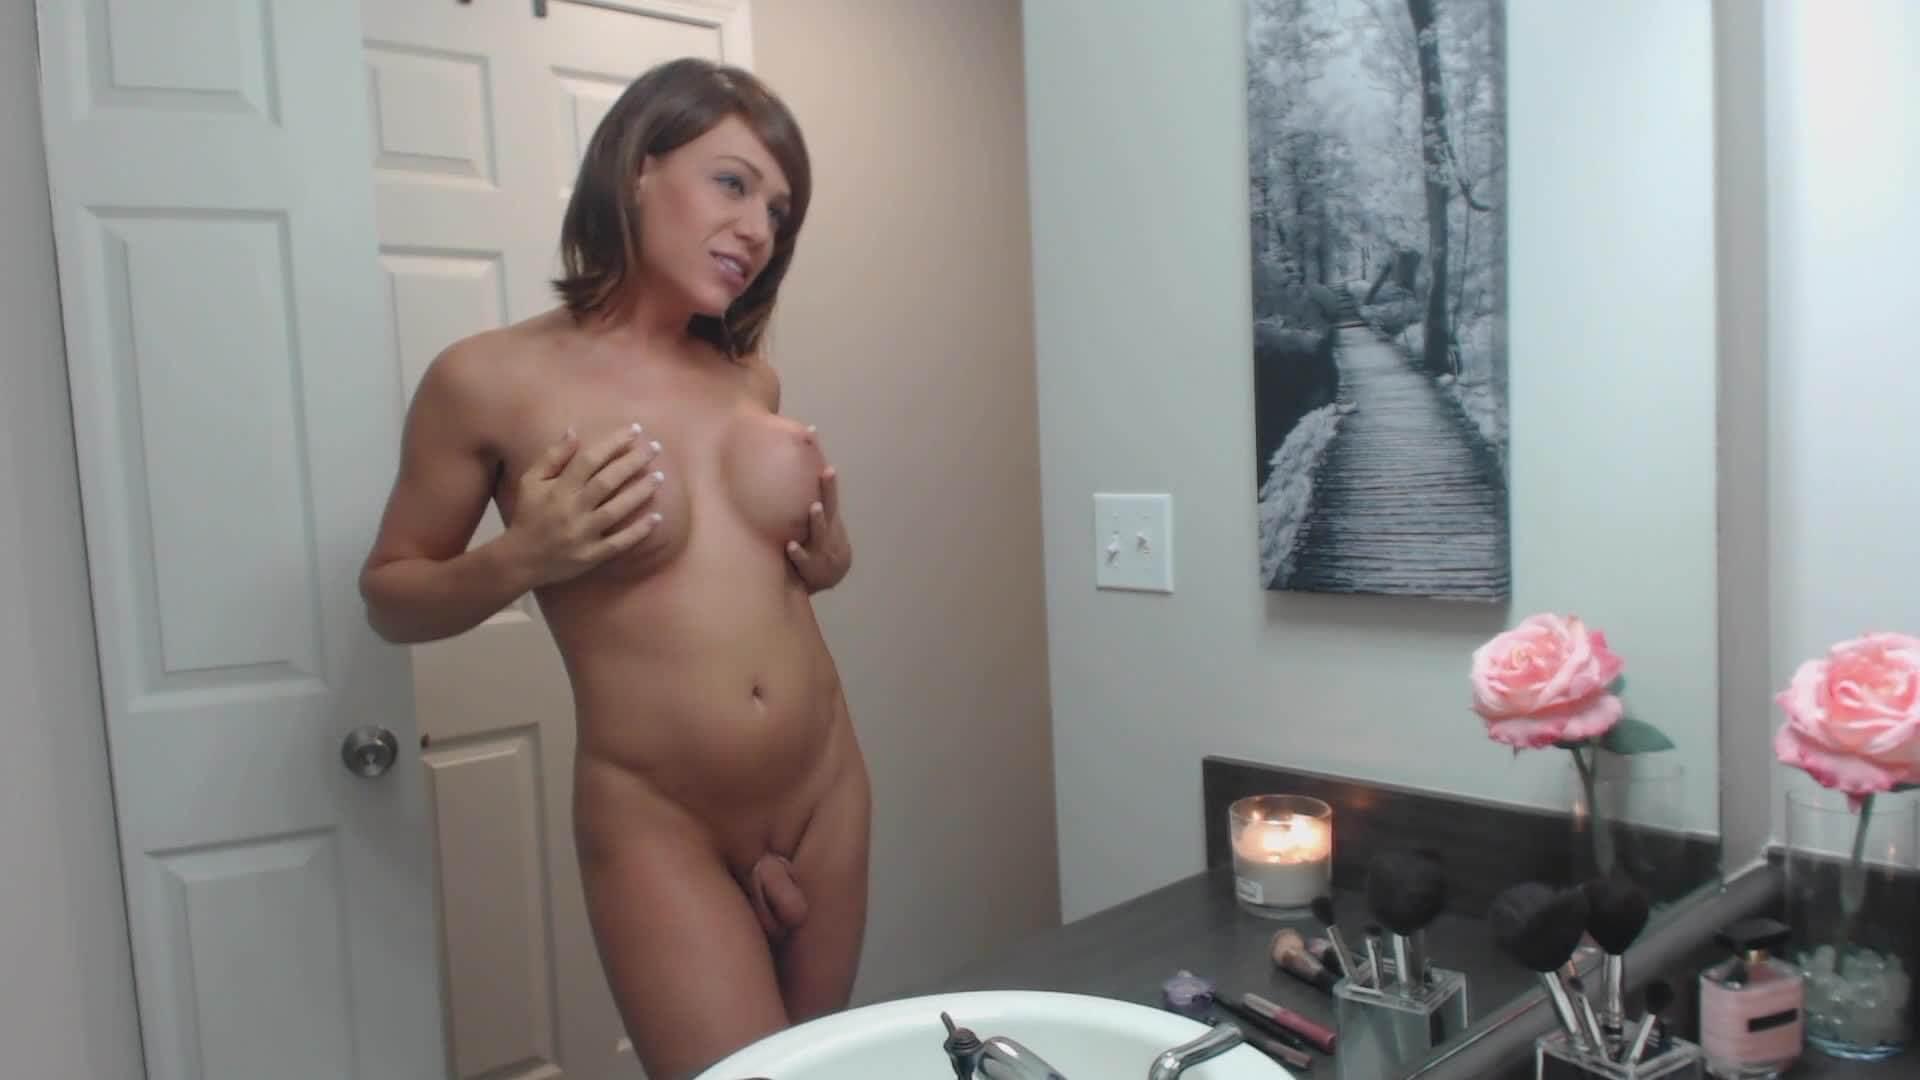 Nikki Jade Taylor travesti